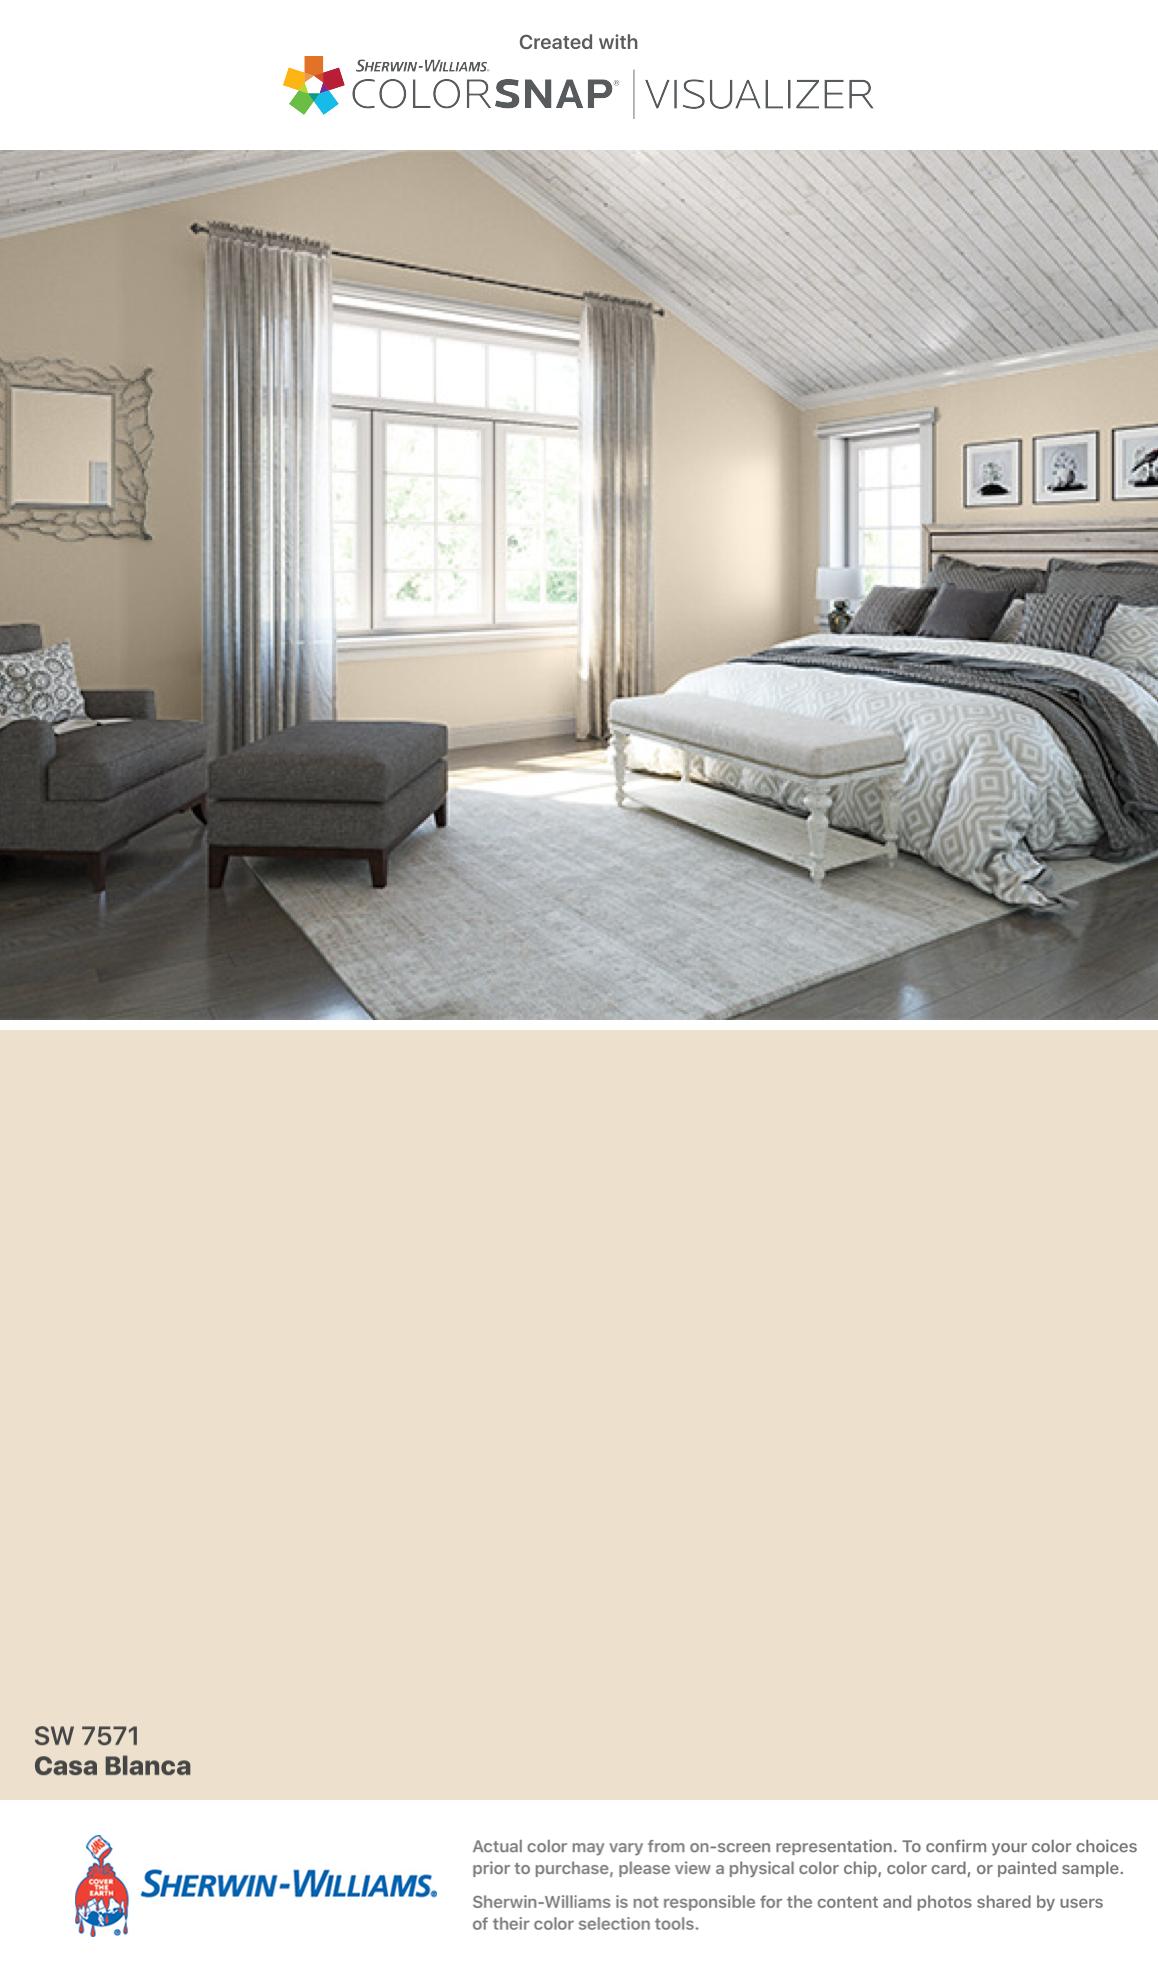 Sw Casa Blanca : blanca, Paint, Color, Interior, Trim:, Sherwin-Williams:, Blanca, 7571)., Bedroom, Colors,, Colors, Home,, Remodel